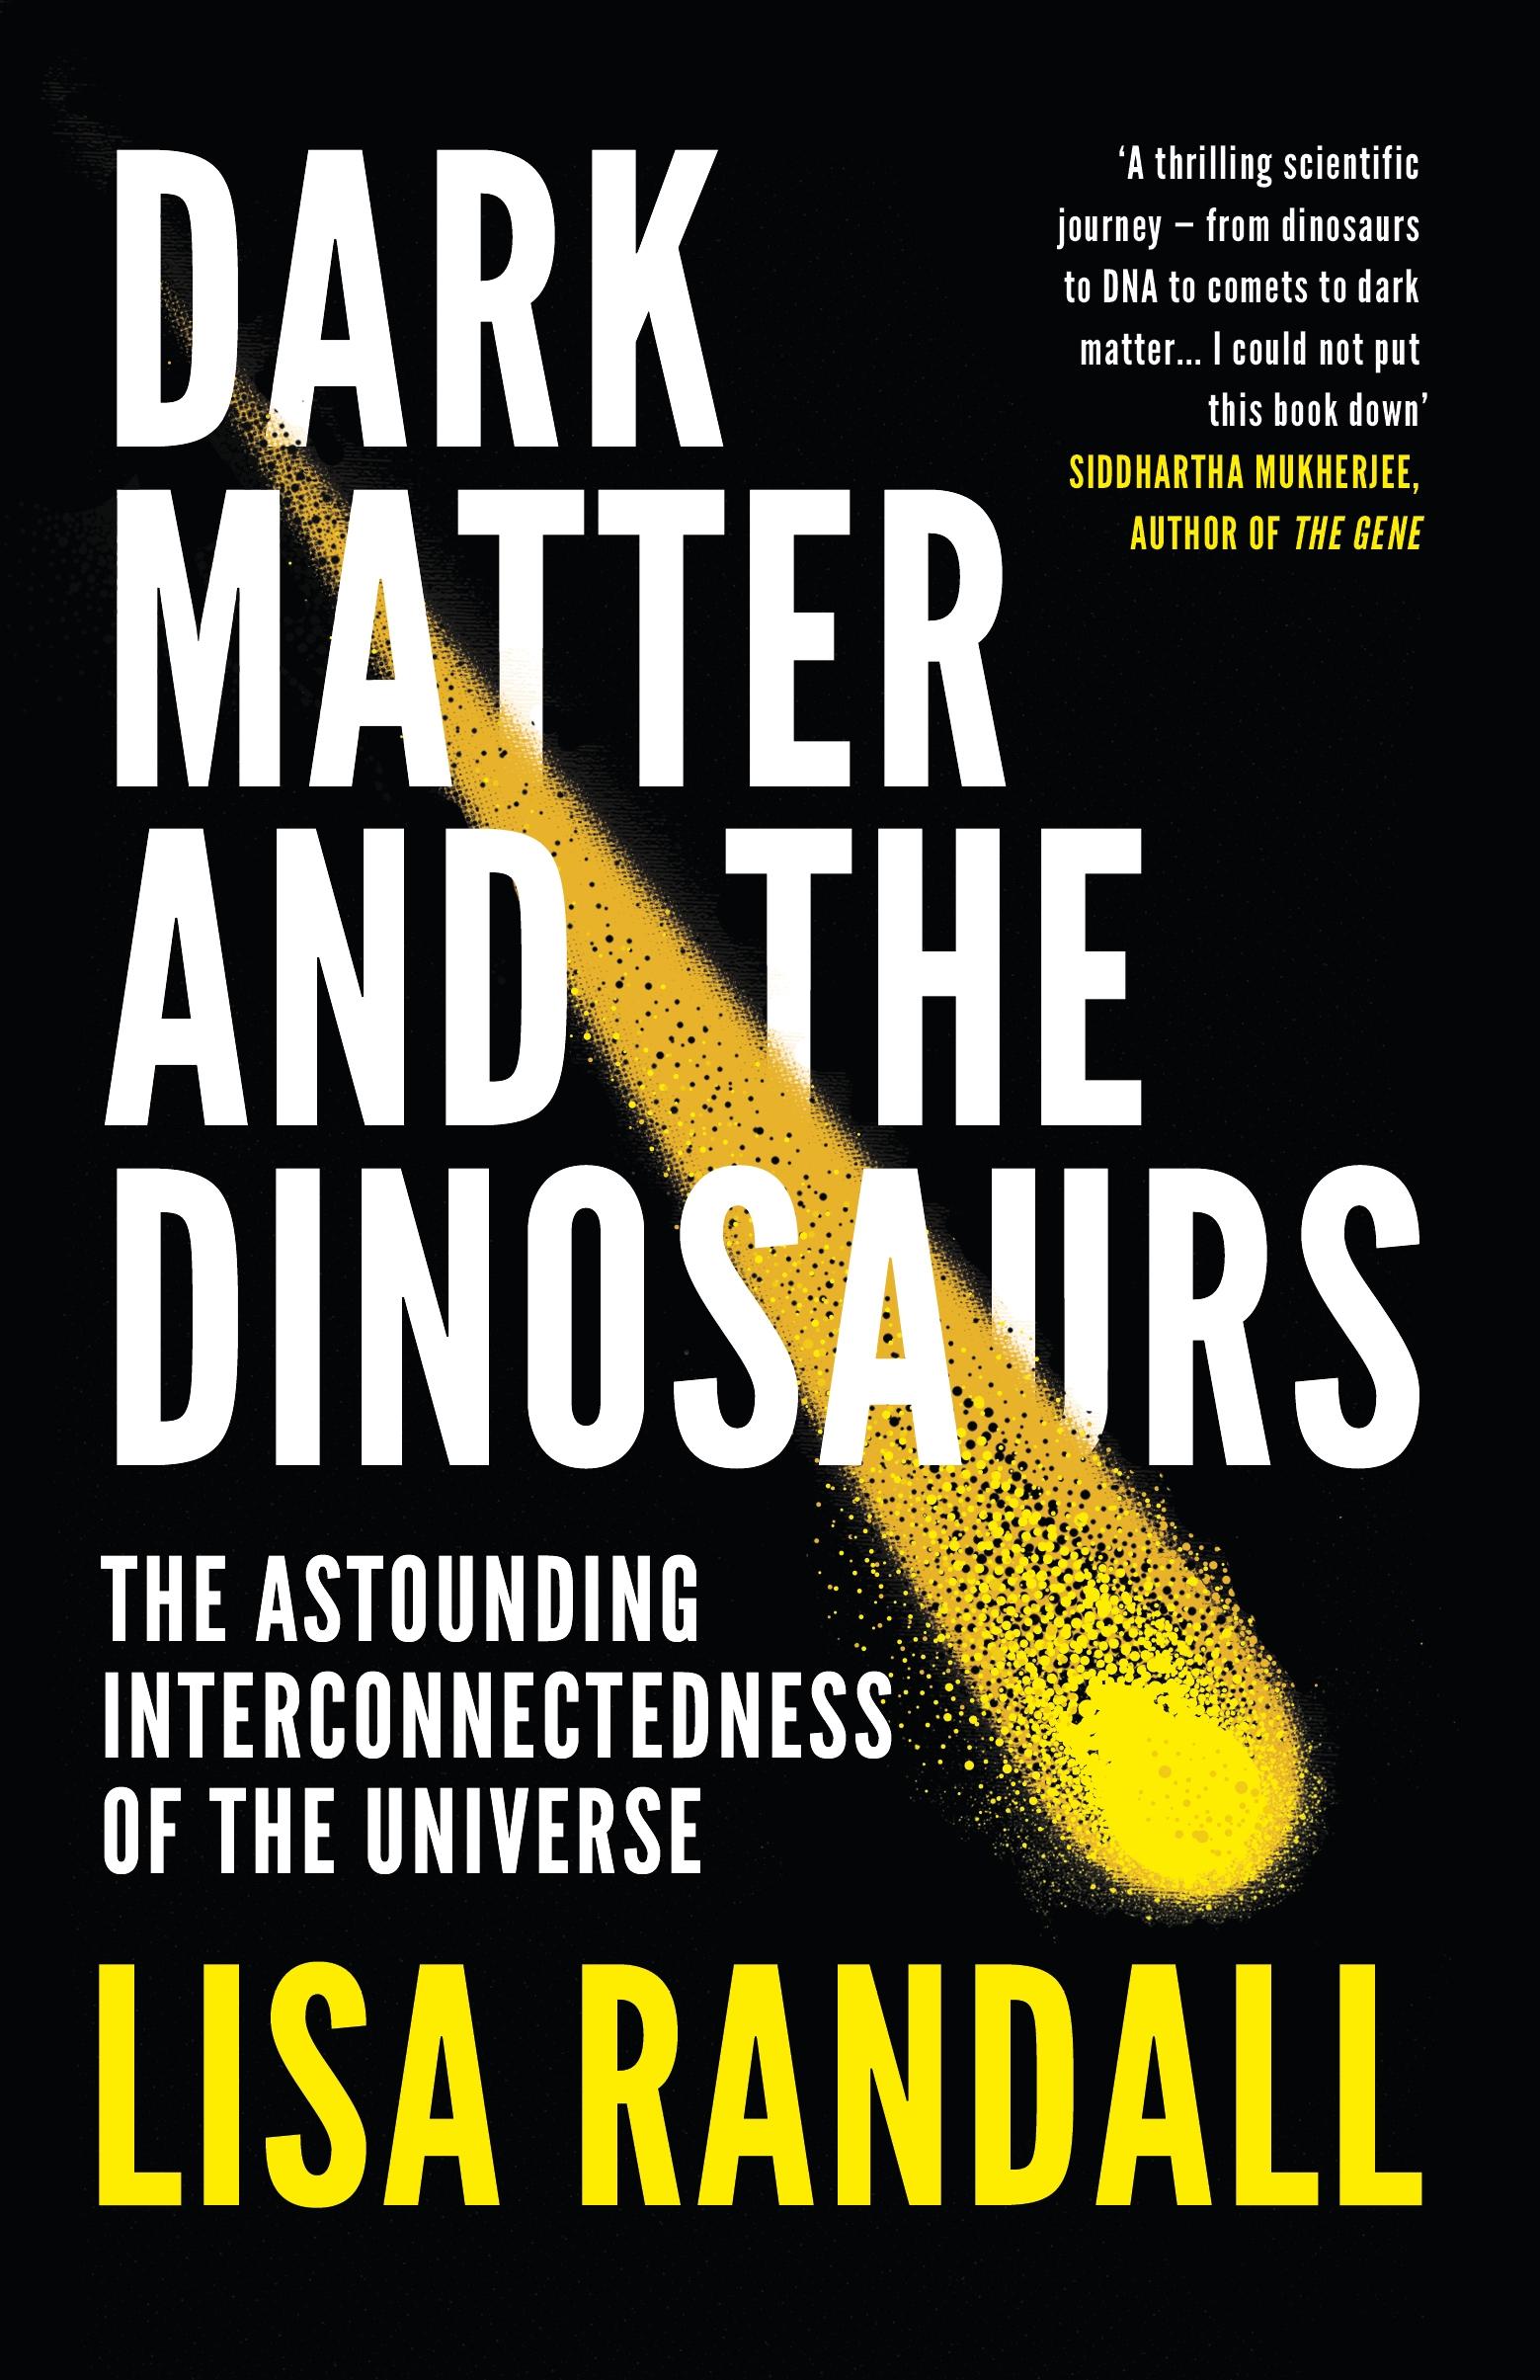 Dark Matter and the Dinosaurs by Lisa Randall - Penguin ...